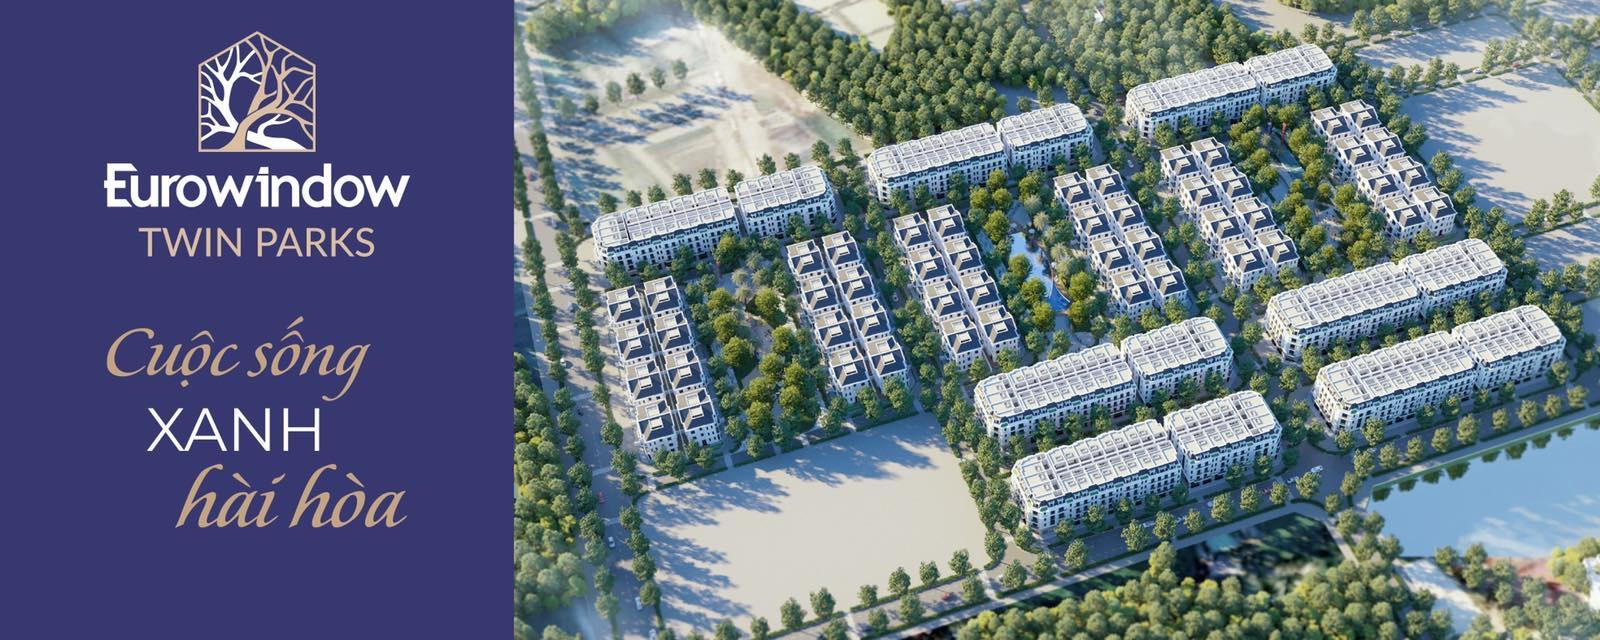 dự án eurowindow twin parks gia lâm